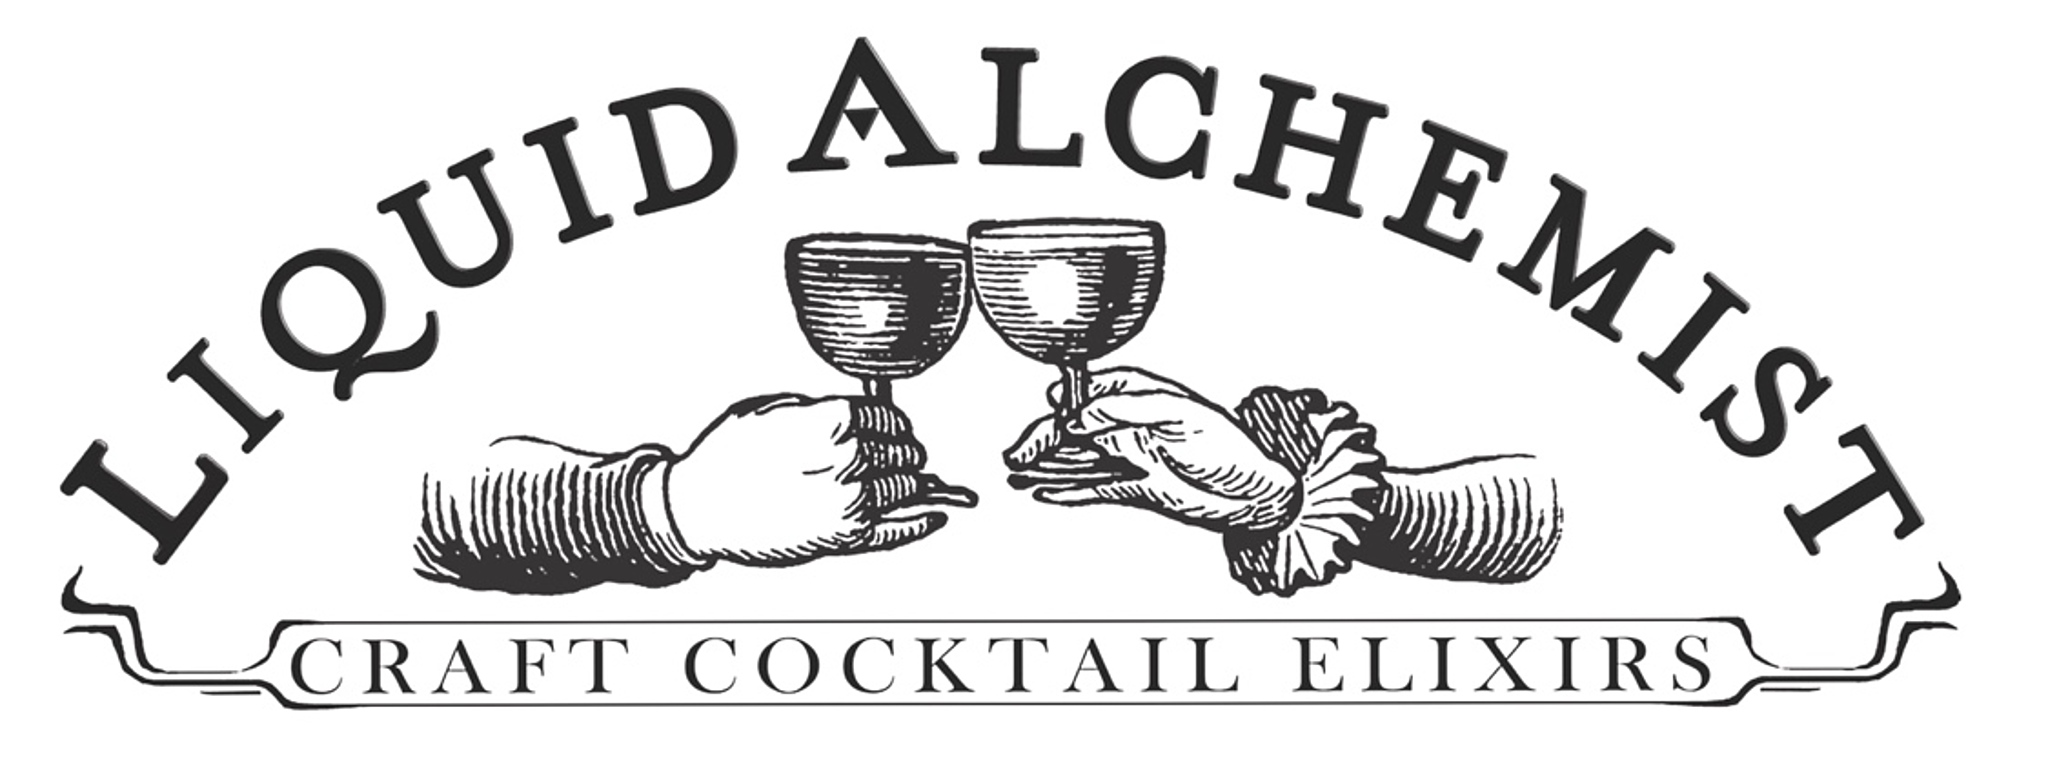 Cover fill liquid alchemist logo